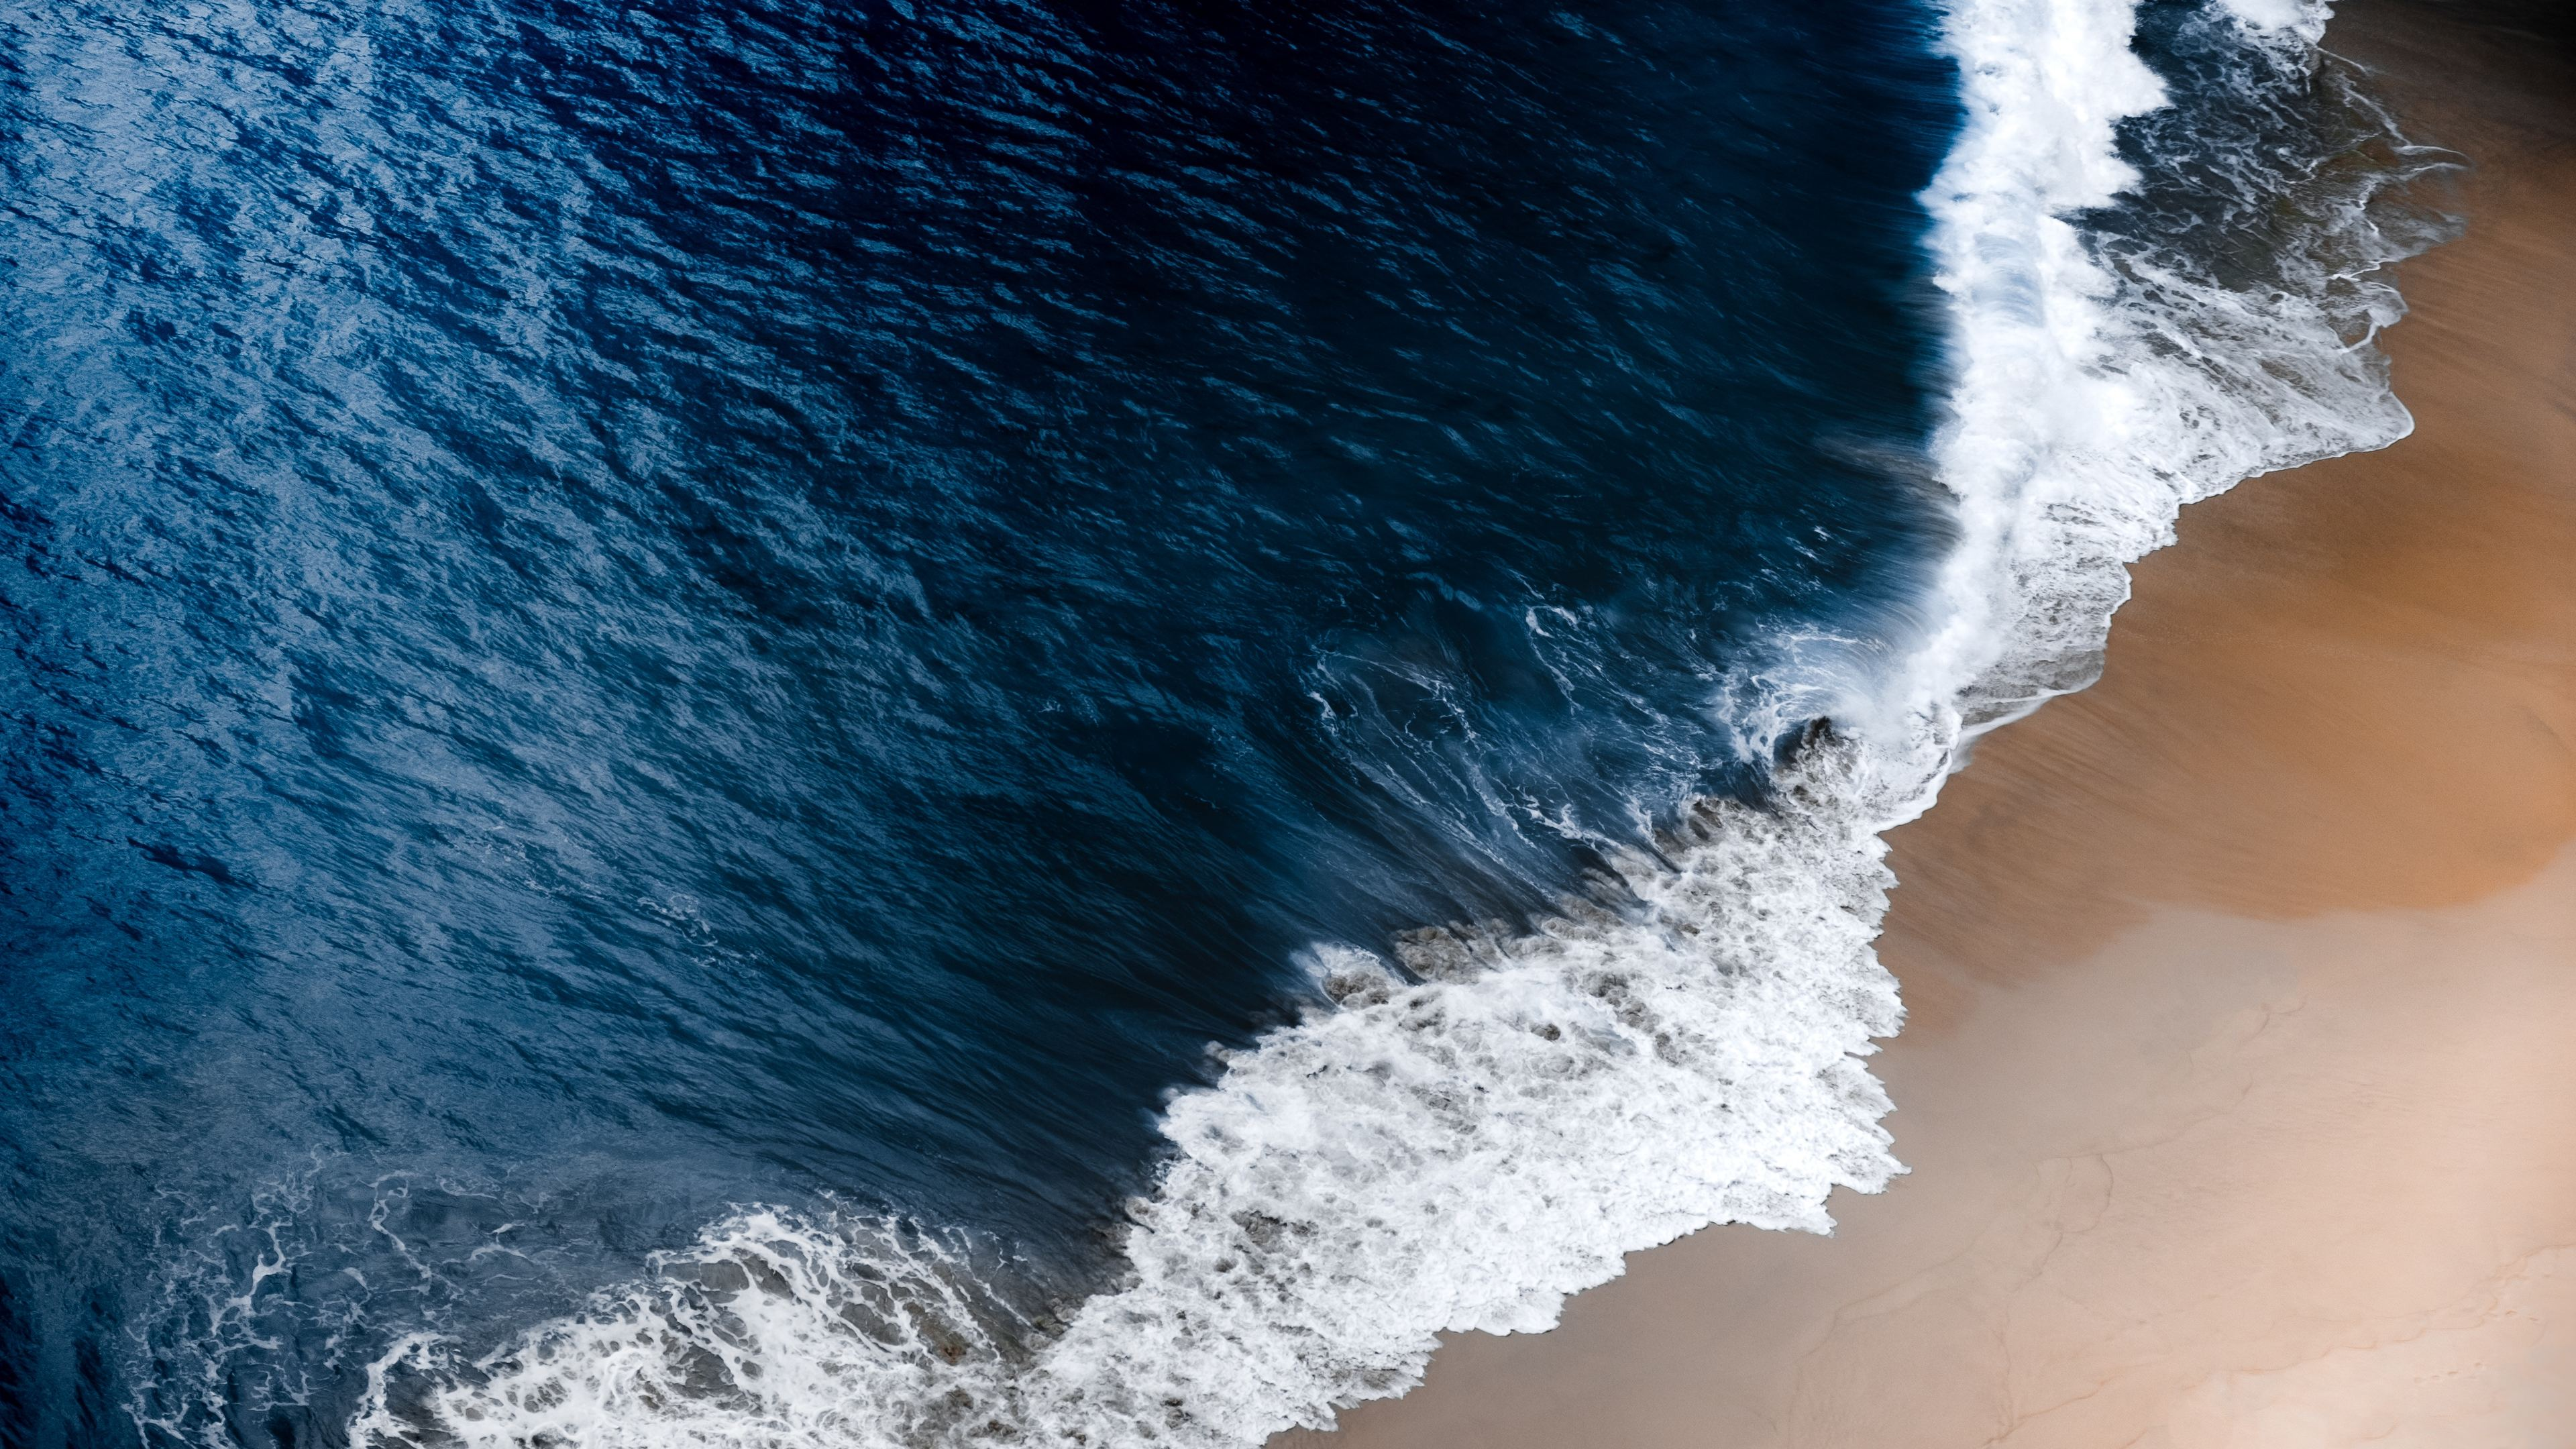 Wallpaper 4k Blue Ocean Waves 4k 4k Wallpapers 5k Wallpapers Hd Wallpapers Nature Wallpapers Ocean Wallpapers Waves Wallpapers